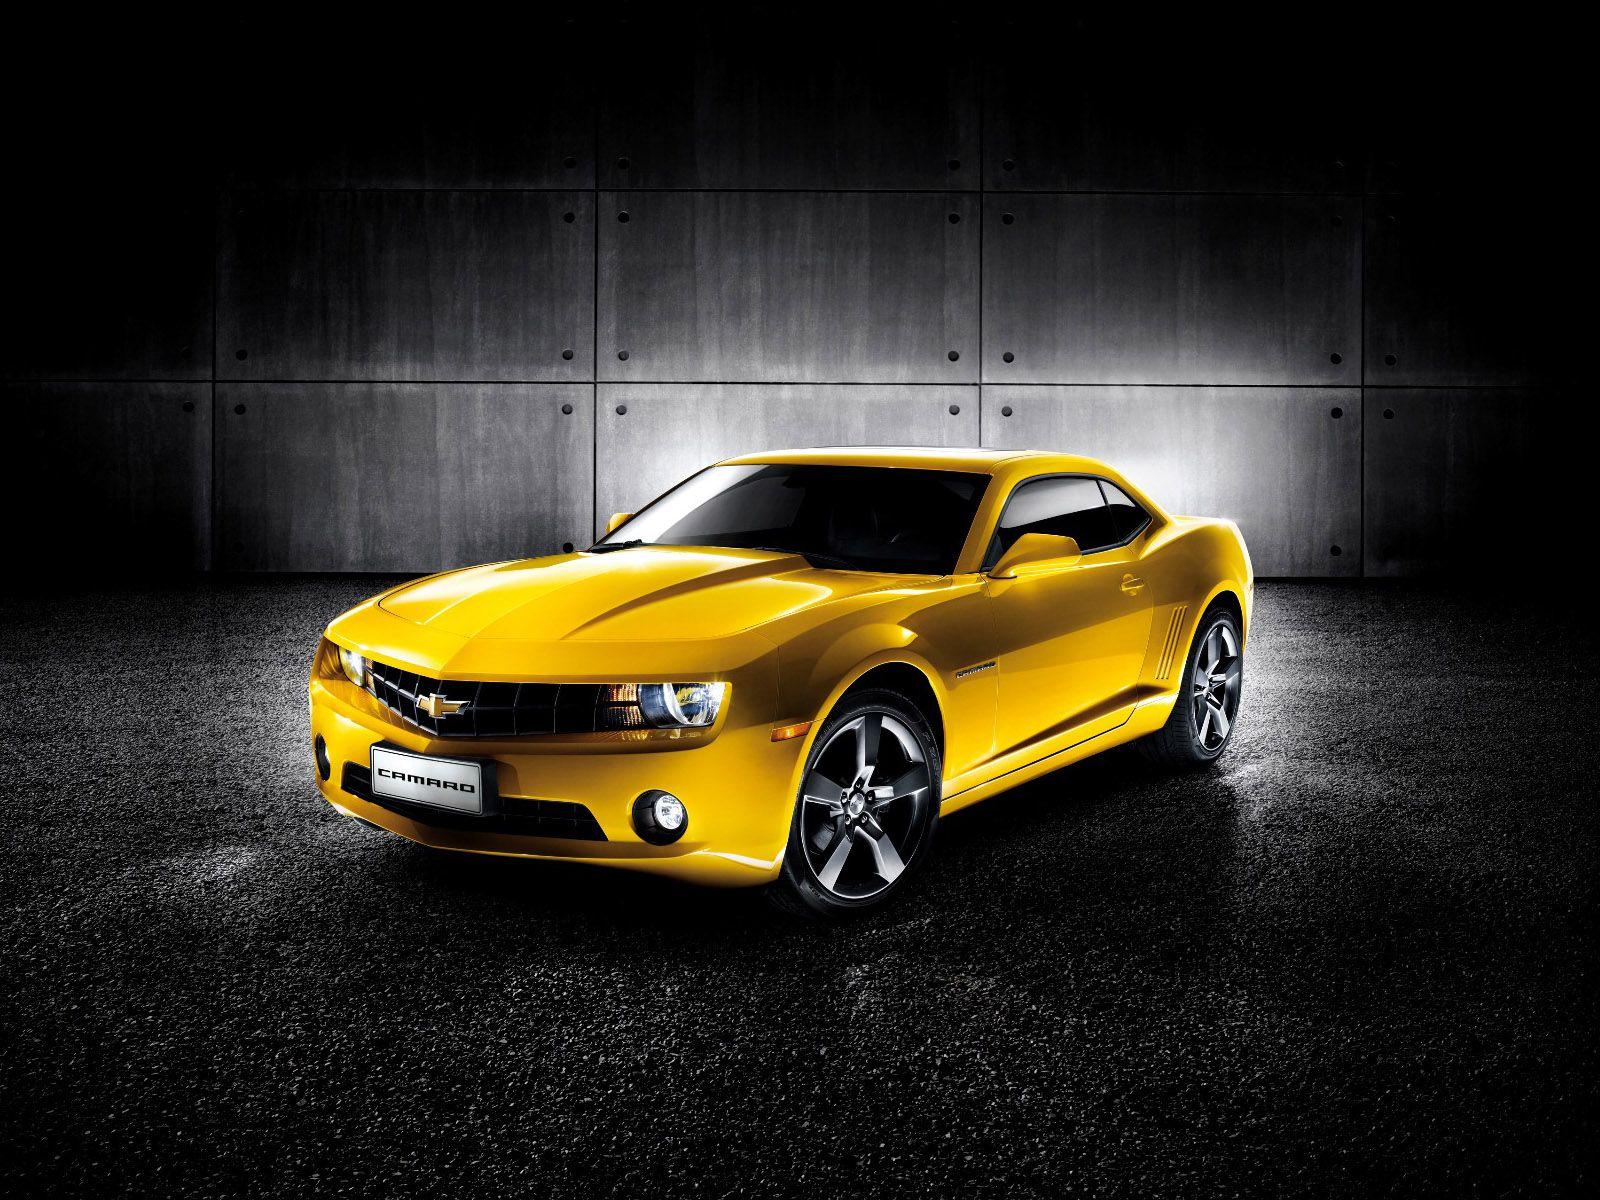 Transformers bumblebee camaro that car chevrolet - Bumblebee desktop wallpapers ...